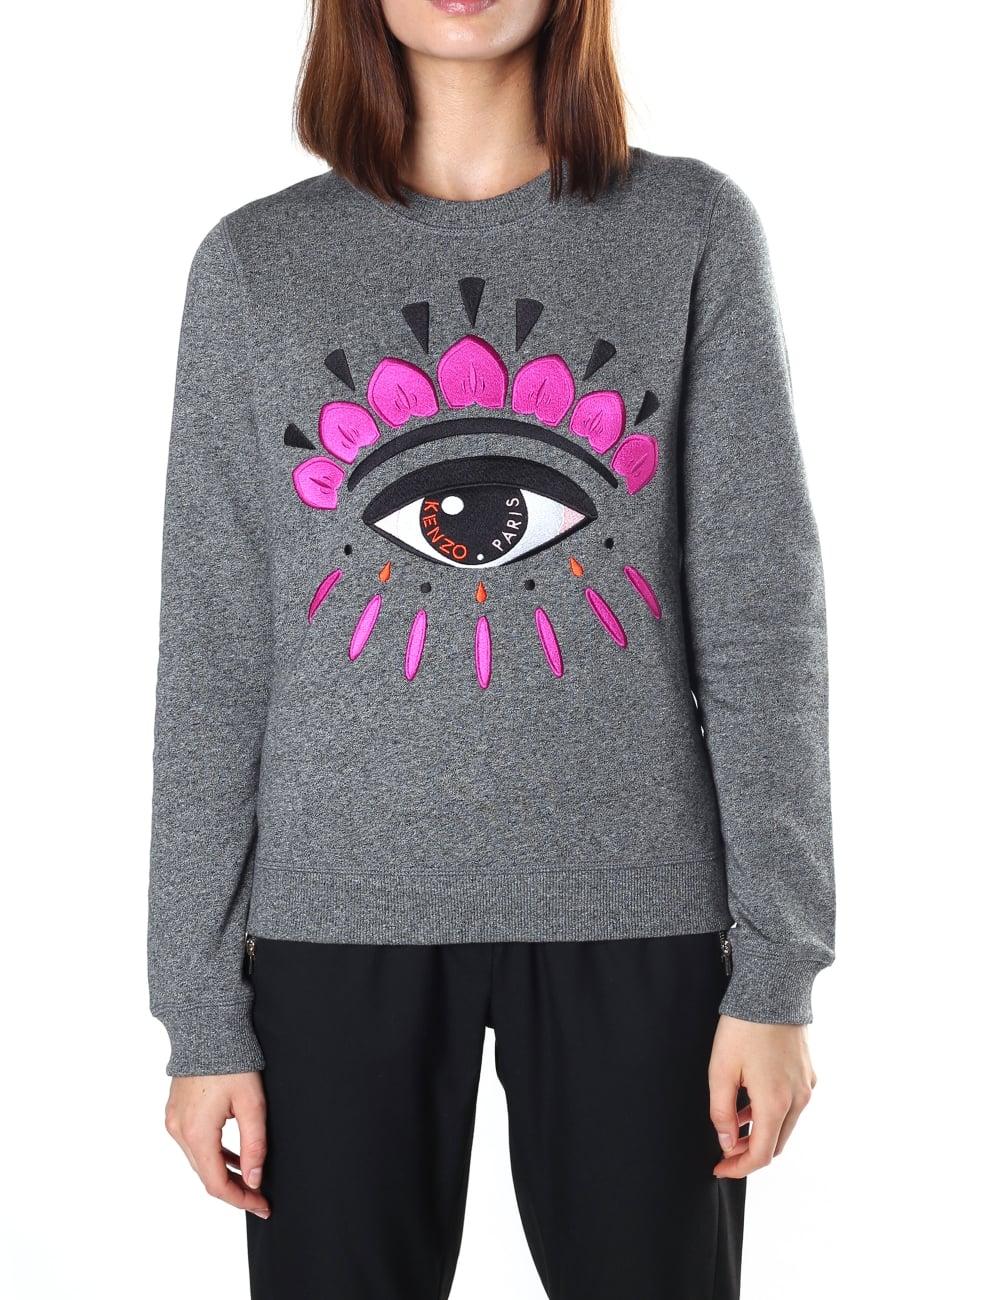 99dd843ebd79 Kenzo Women's Classic Eye Sweatshirt